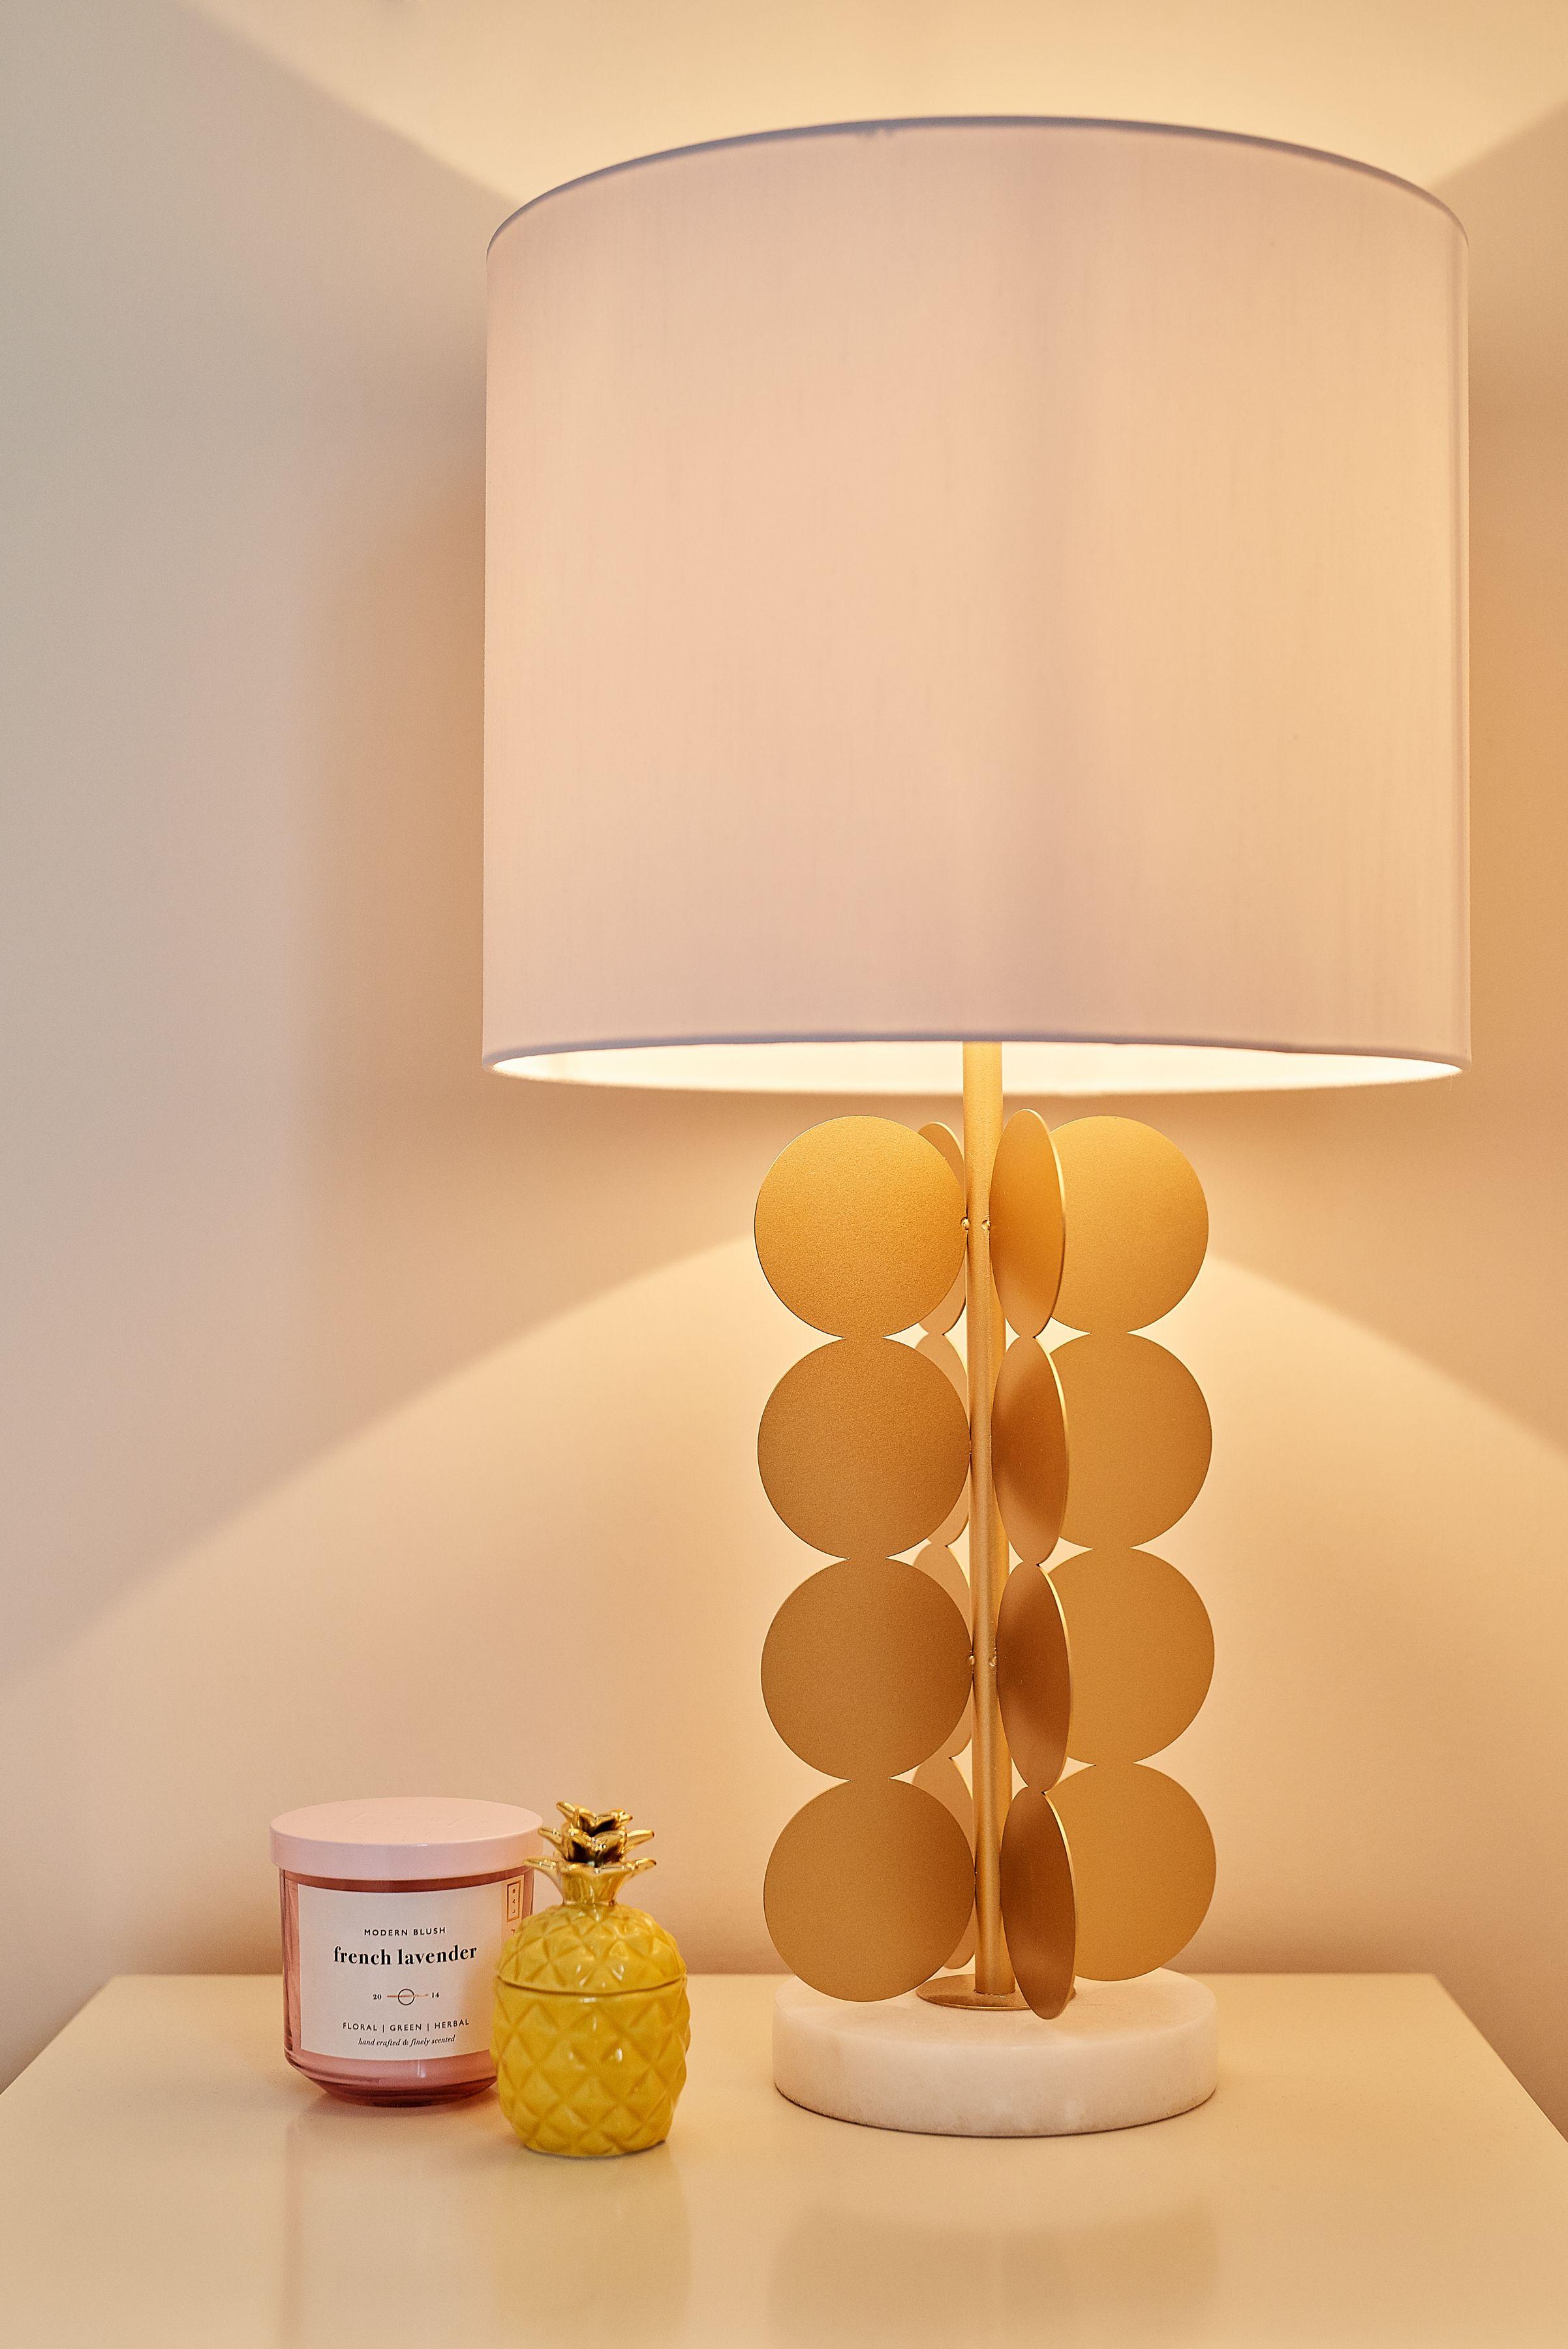 Interior Design Decorum Interior Design Photography Richard Kiely Photography Bedroom Bedroomfurniture Retro Table Lamps Table Lamp Table Lamp Lighting